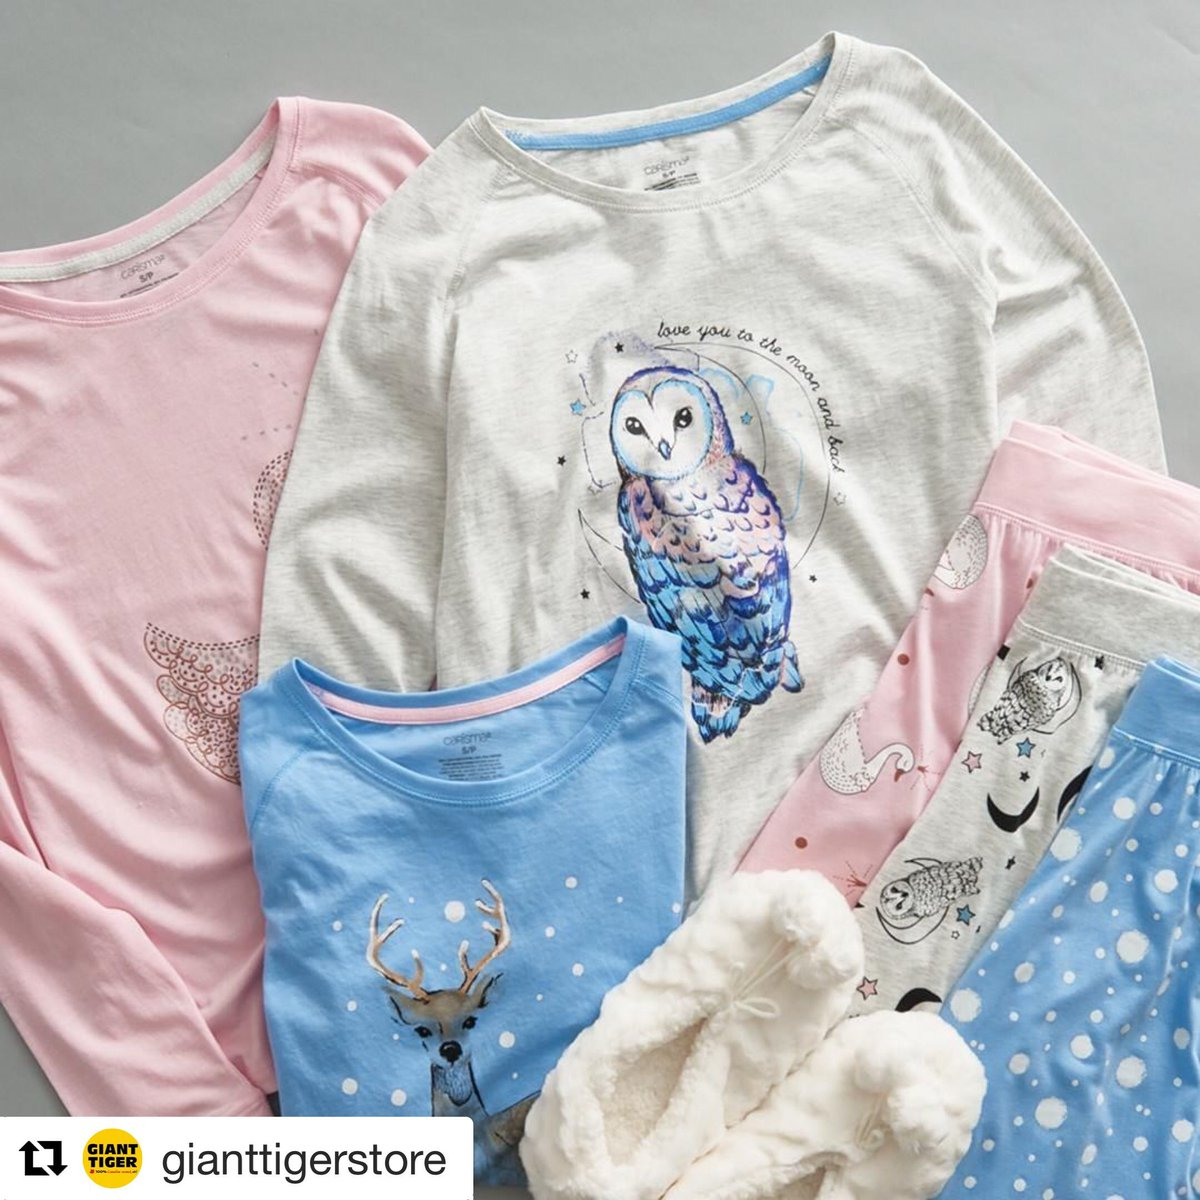 e2ddb6f60df03f #GiantTiger #ForYouForLess #Carisma #PJs #PJparty #bedtime #Pyjamas  #comfycozy #supersoft #pjset #printedpjs #comfypjspic.twitter.com/16KD9aCC0j